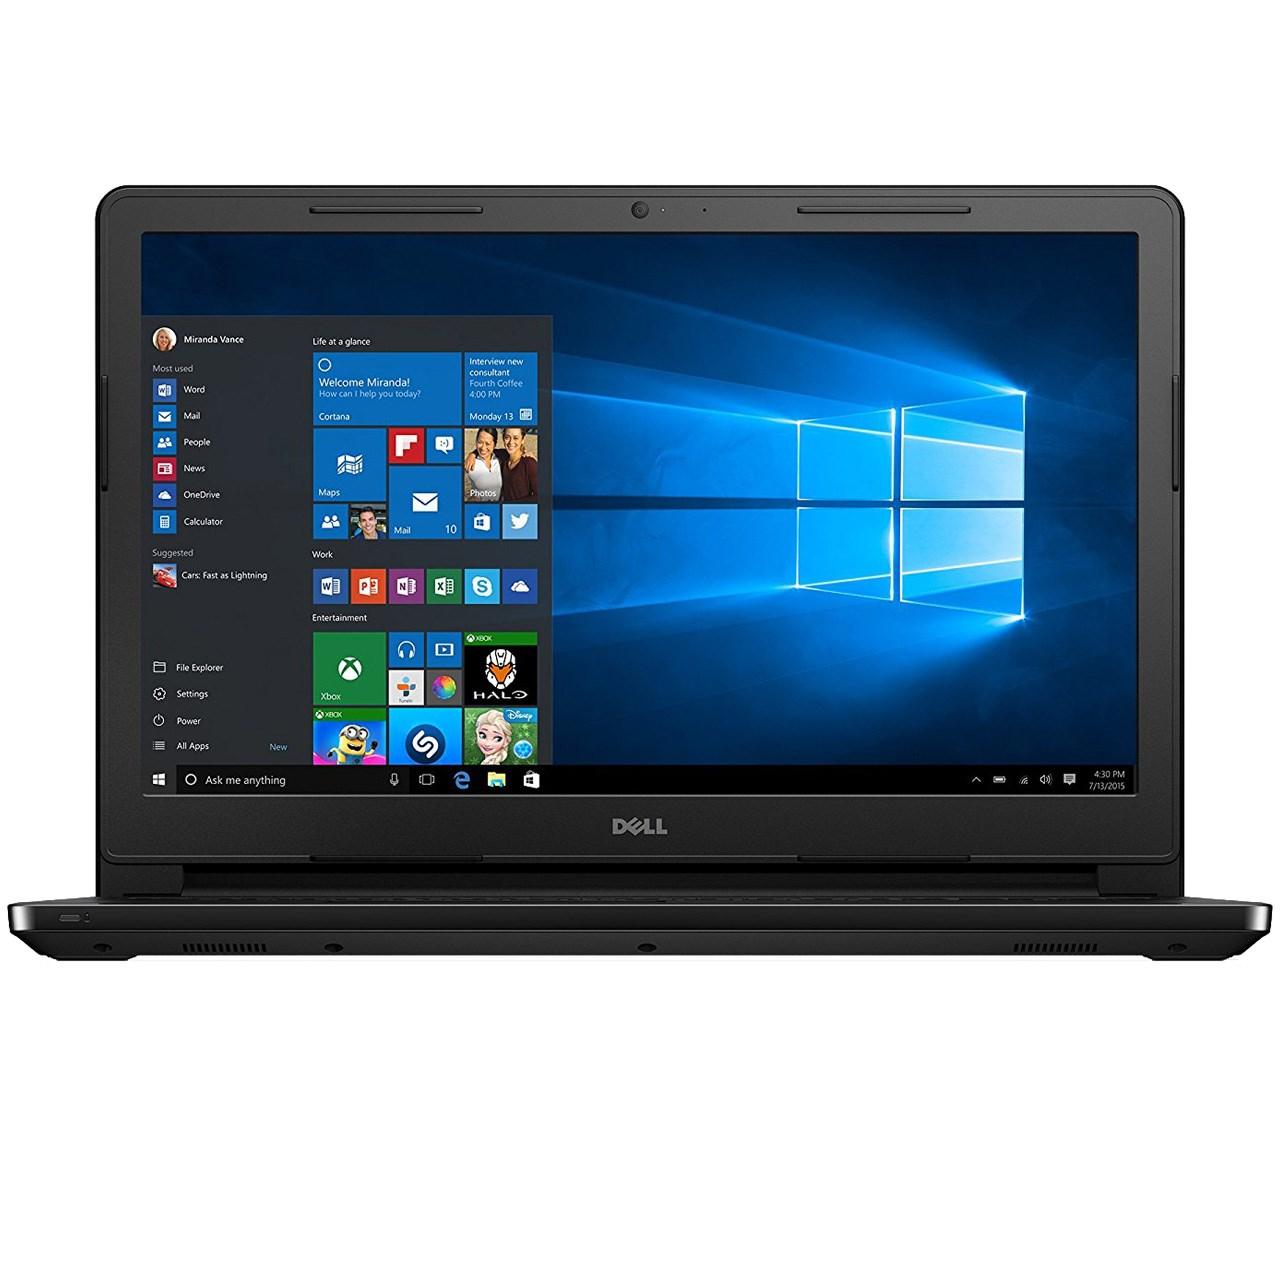 لپ تاپ 15 اینچی دل مدل INSPIRON 15-3567-K | Dell INSPIRON 15-3567-K - 15 inch Laptop